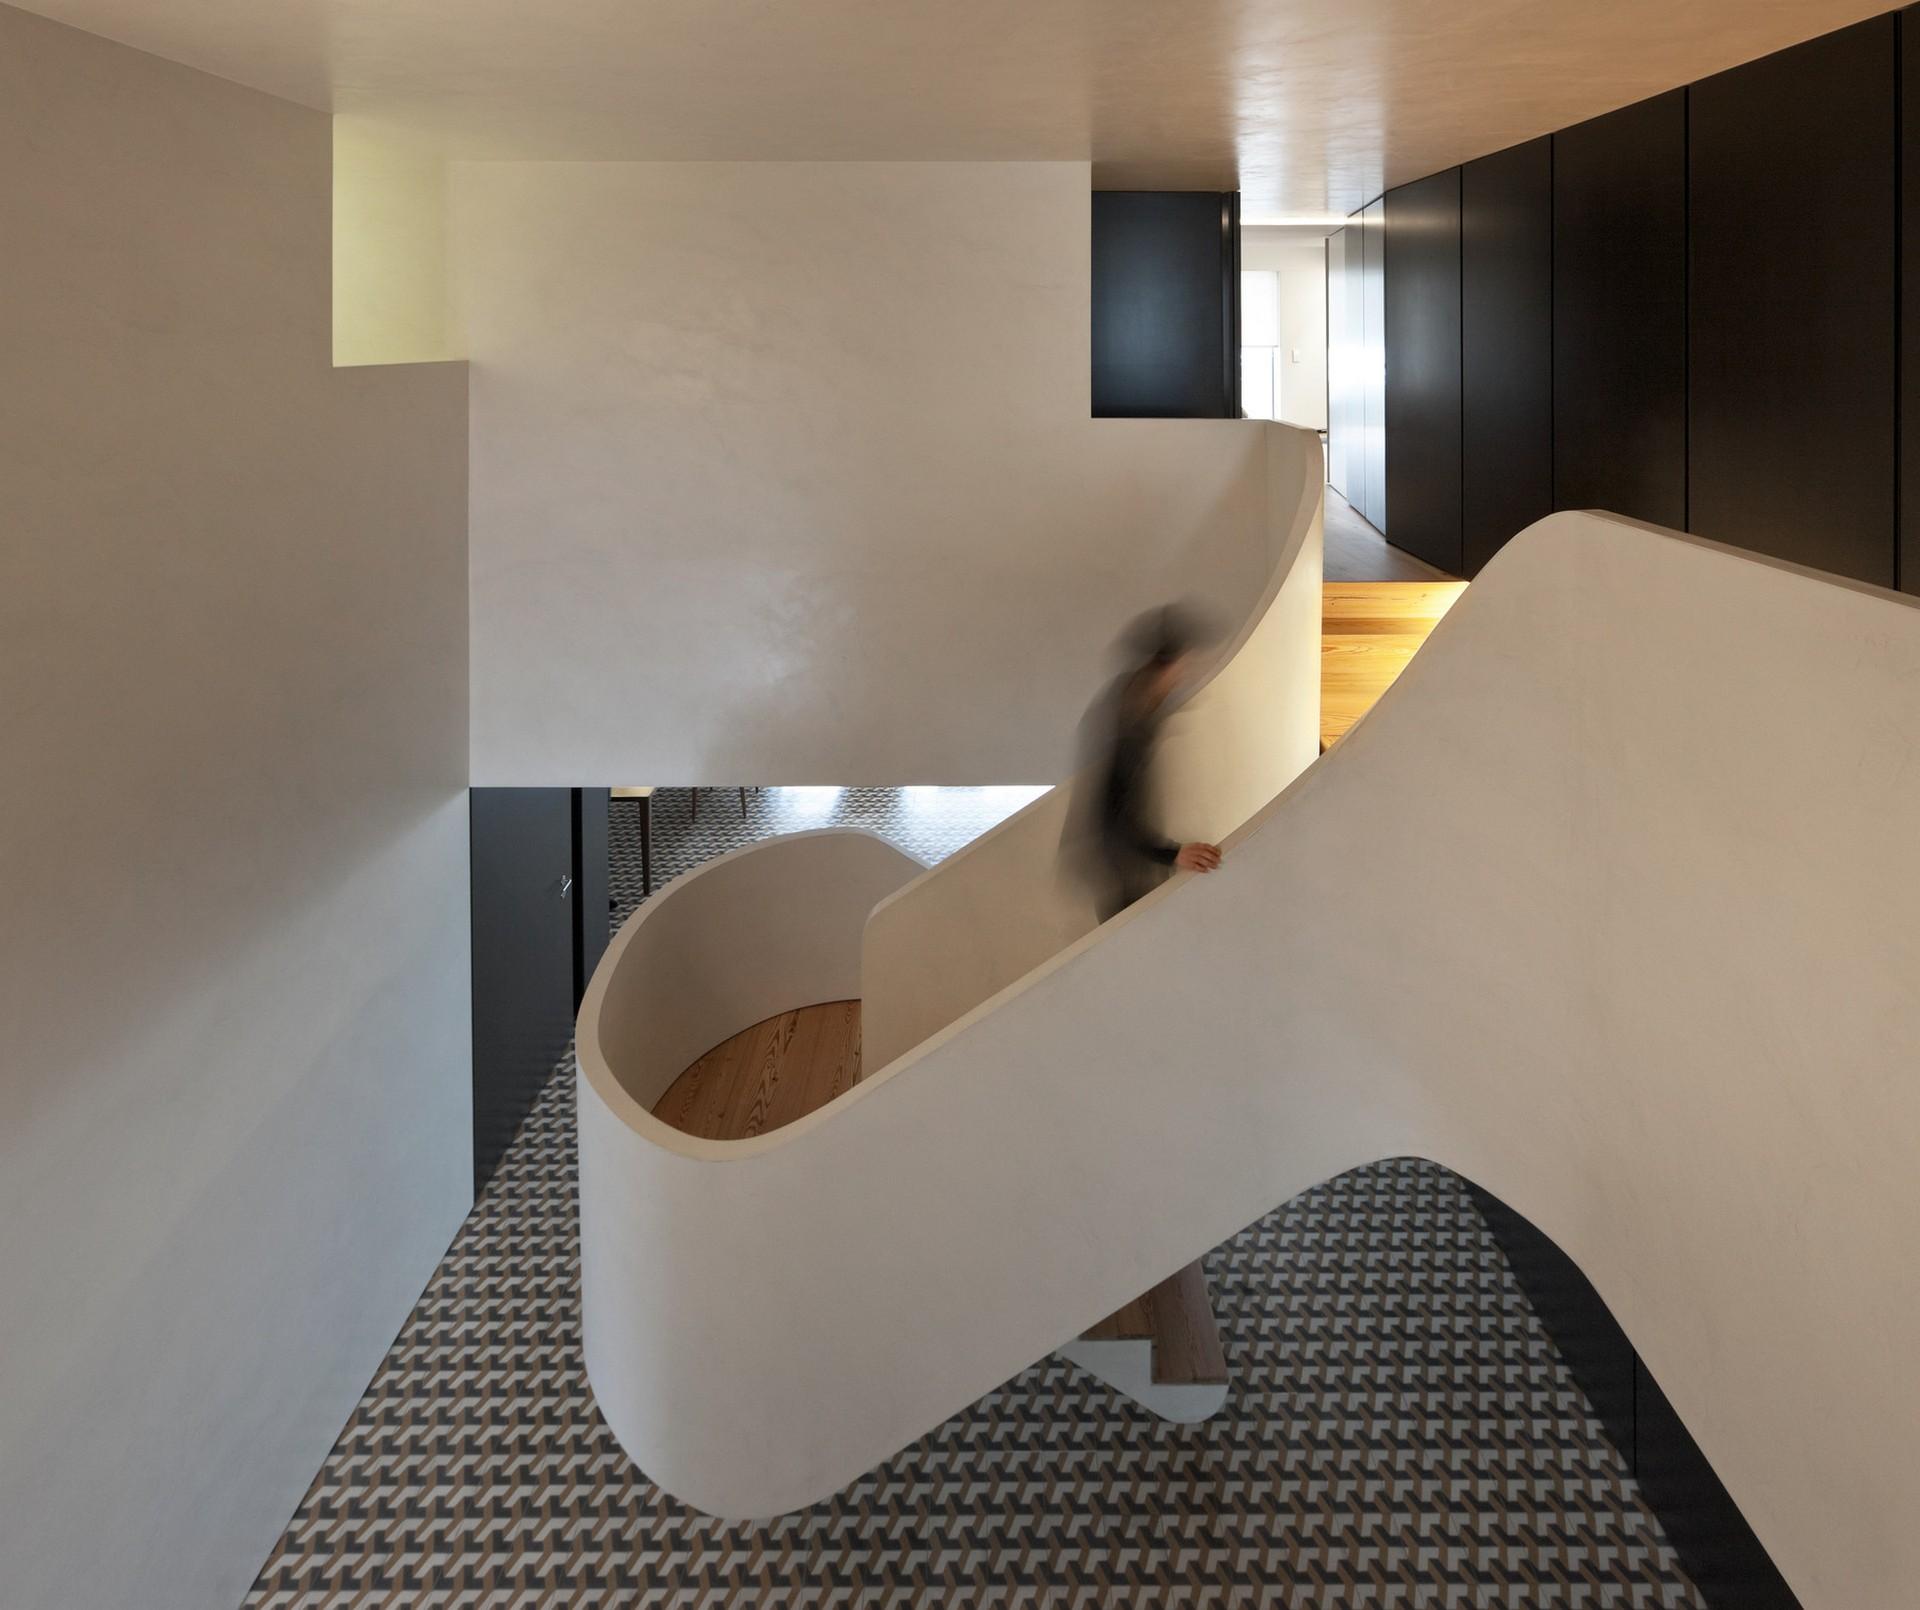 Best Architecture Projects 2 best architecture projects Best Architecture Projects: theHouse by Correia/Ragazzi Arquitectos Best Architecture Projects 2